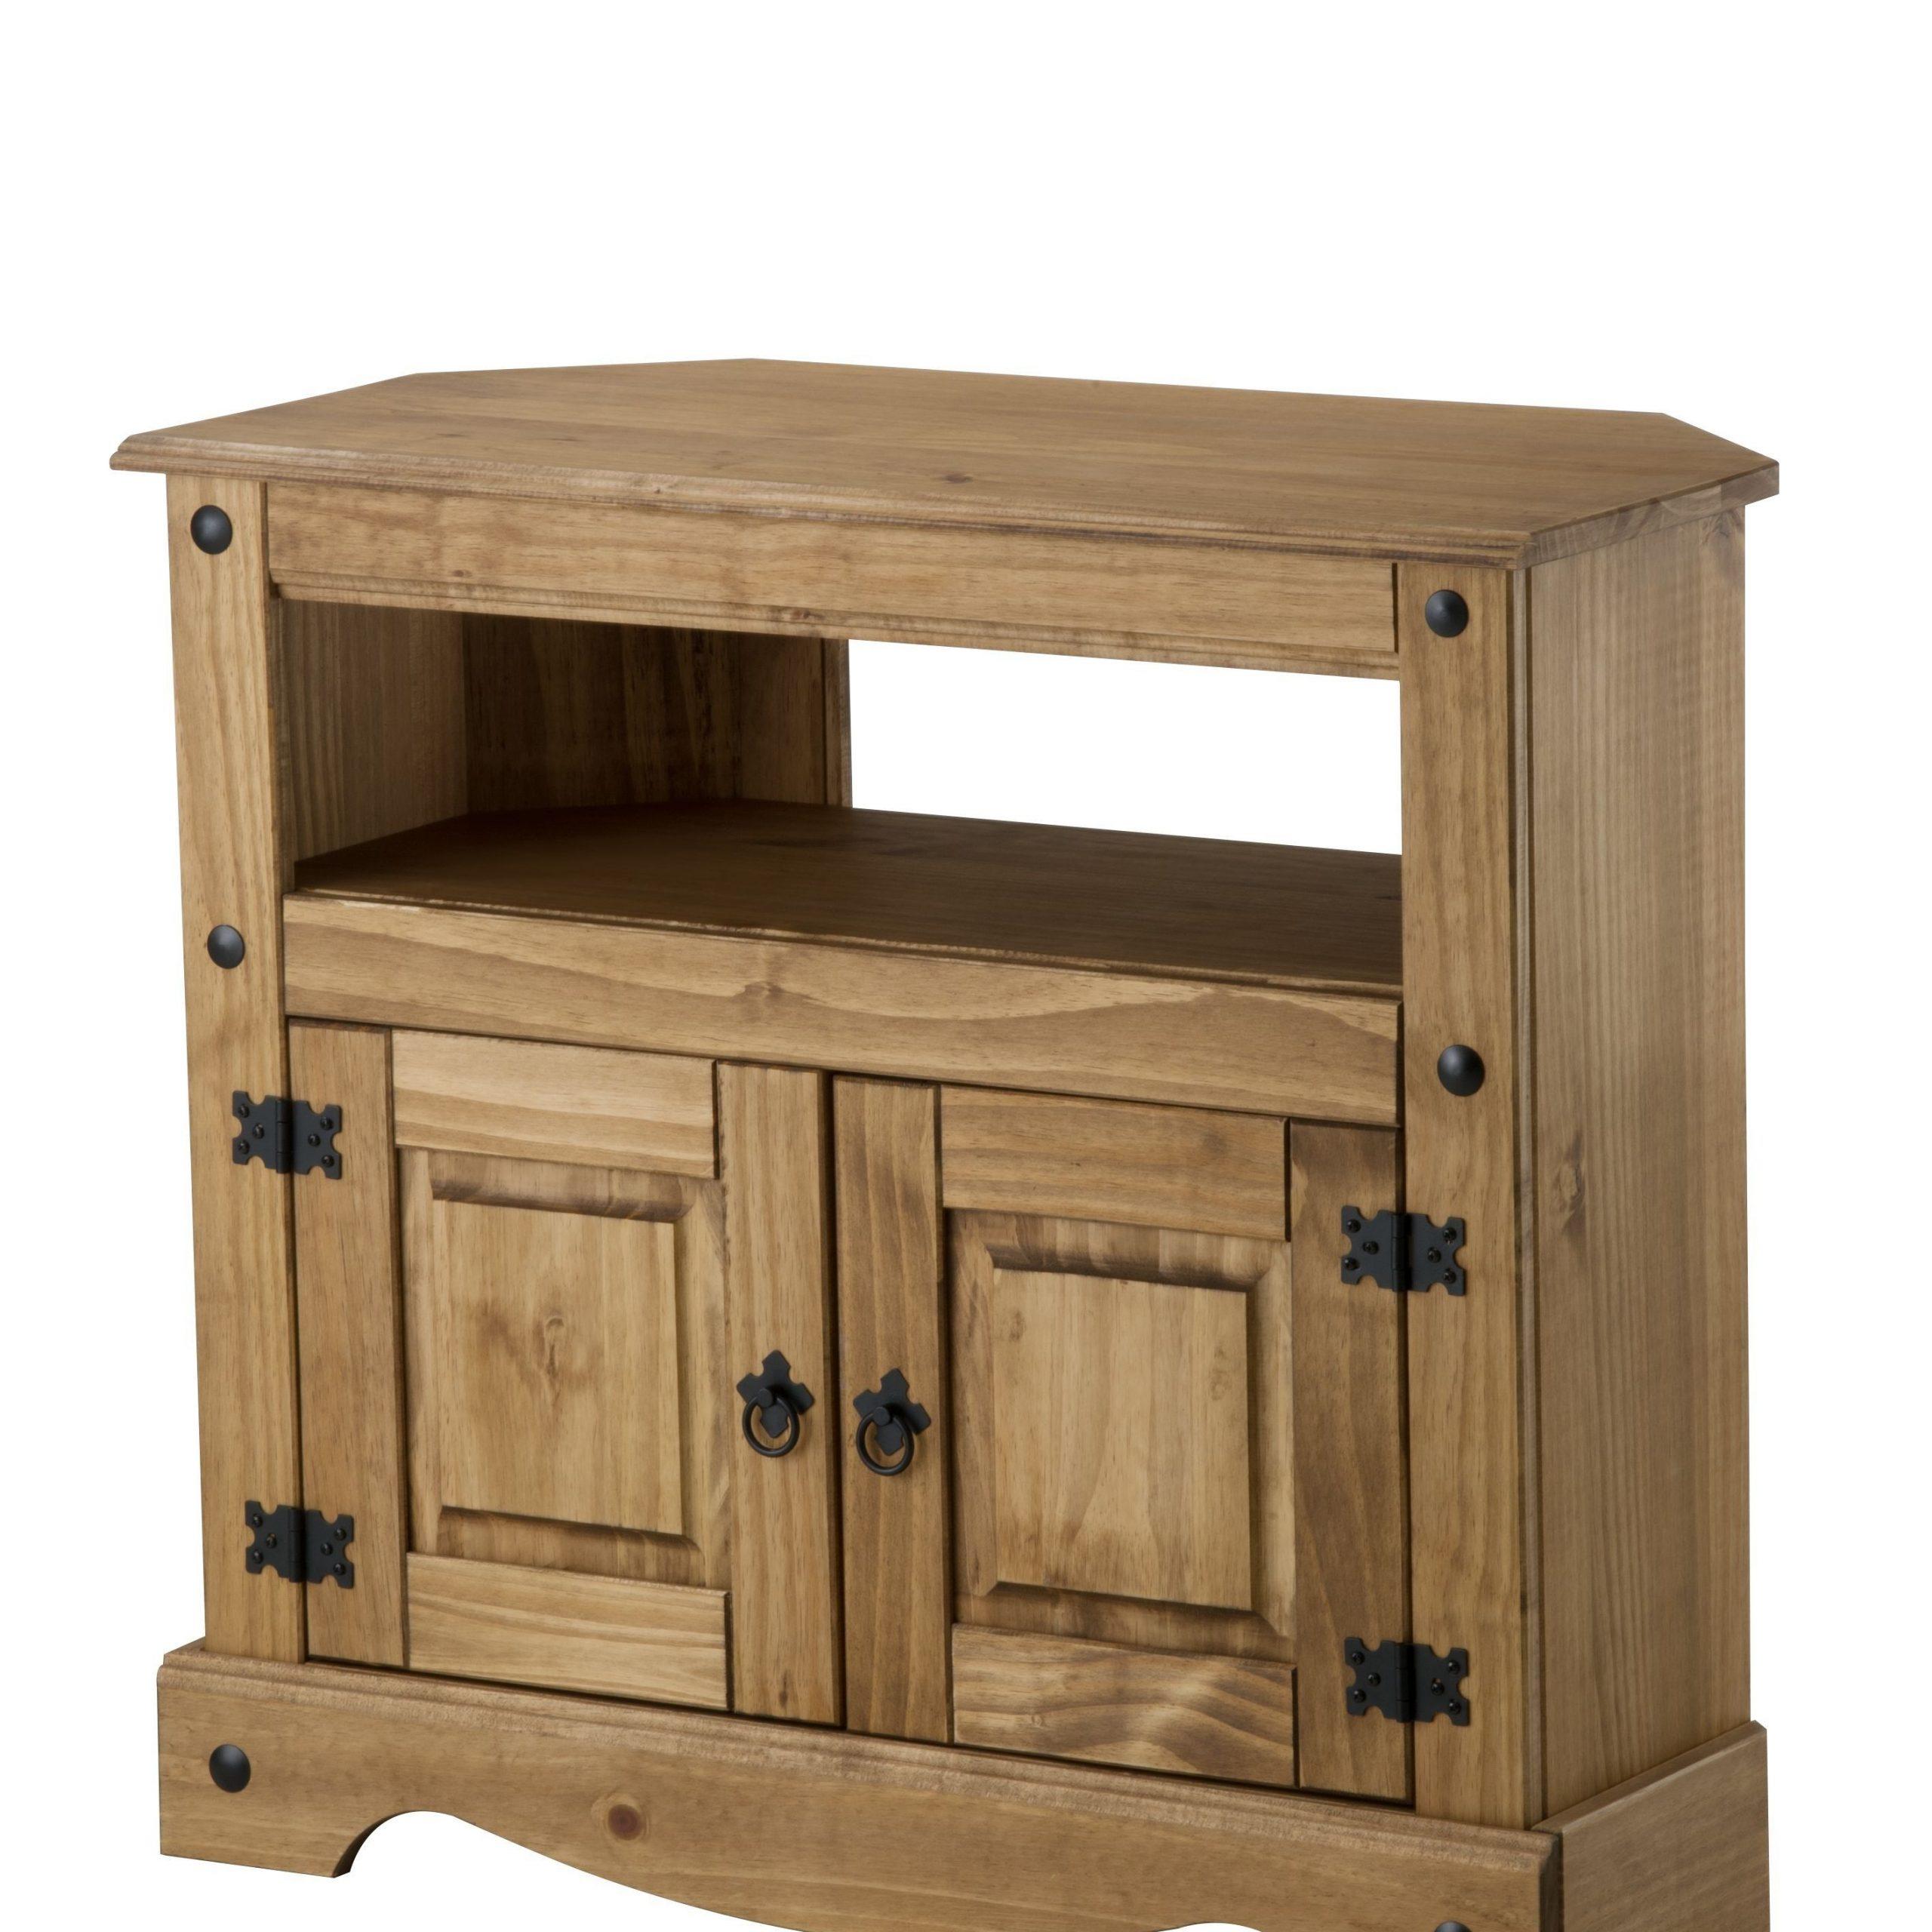 Bonsoni Pine Corona Corner Tv Cabinet   Interior For Corona Corner Tv Stands (View 3 of 20)